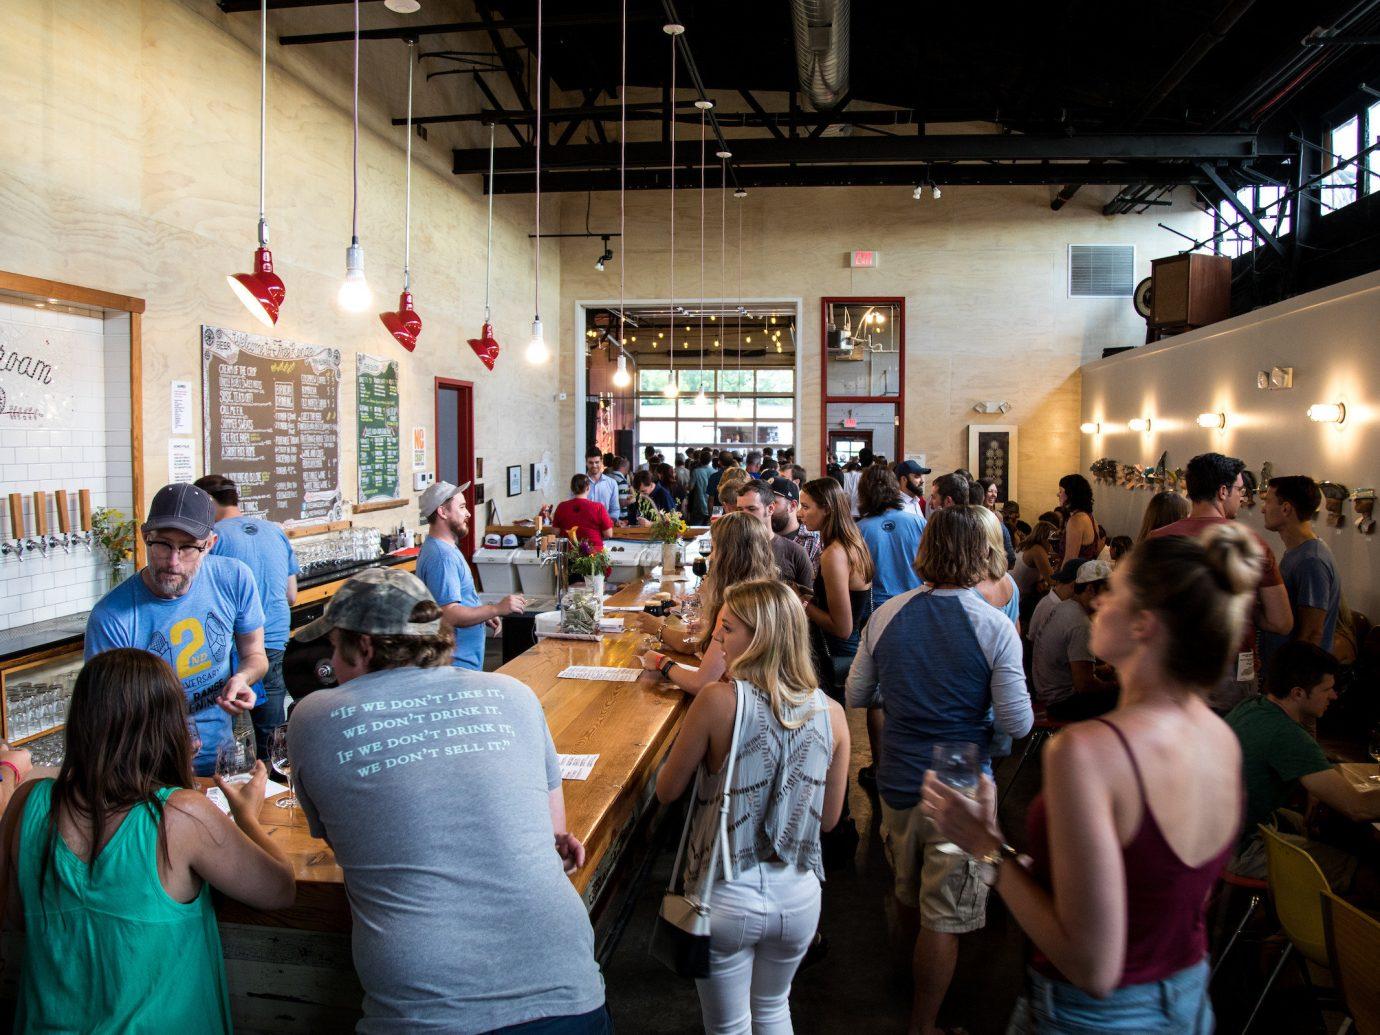 Trip Ideas person indoor ceiling people group scene restaurant Drink crowd